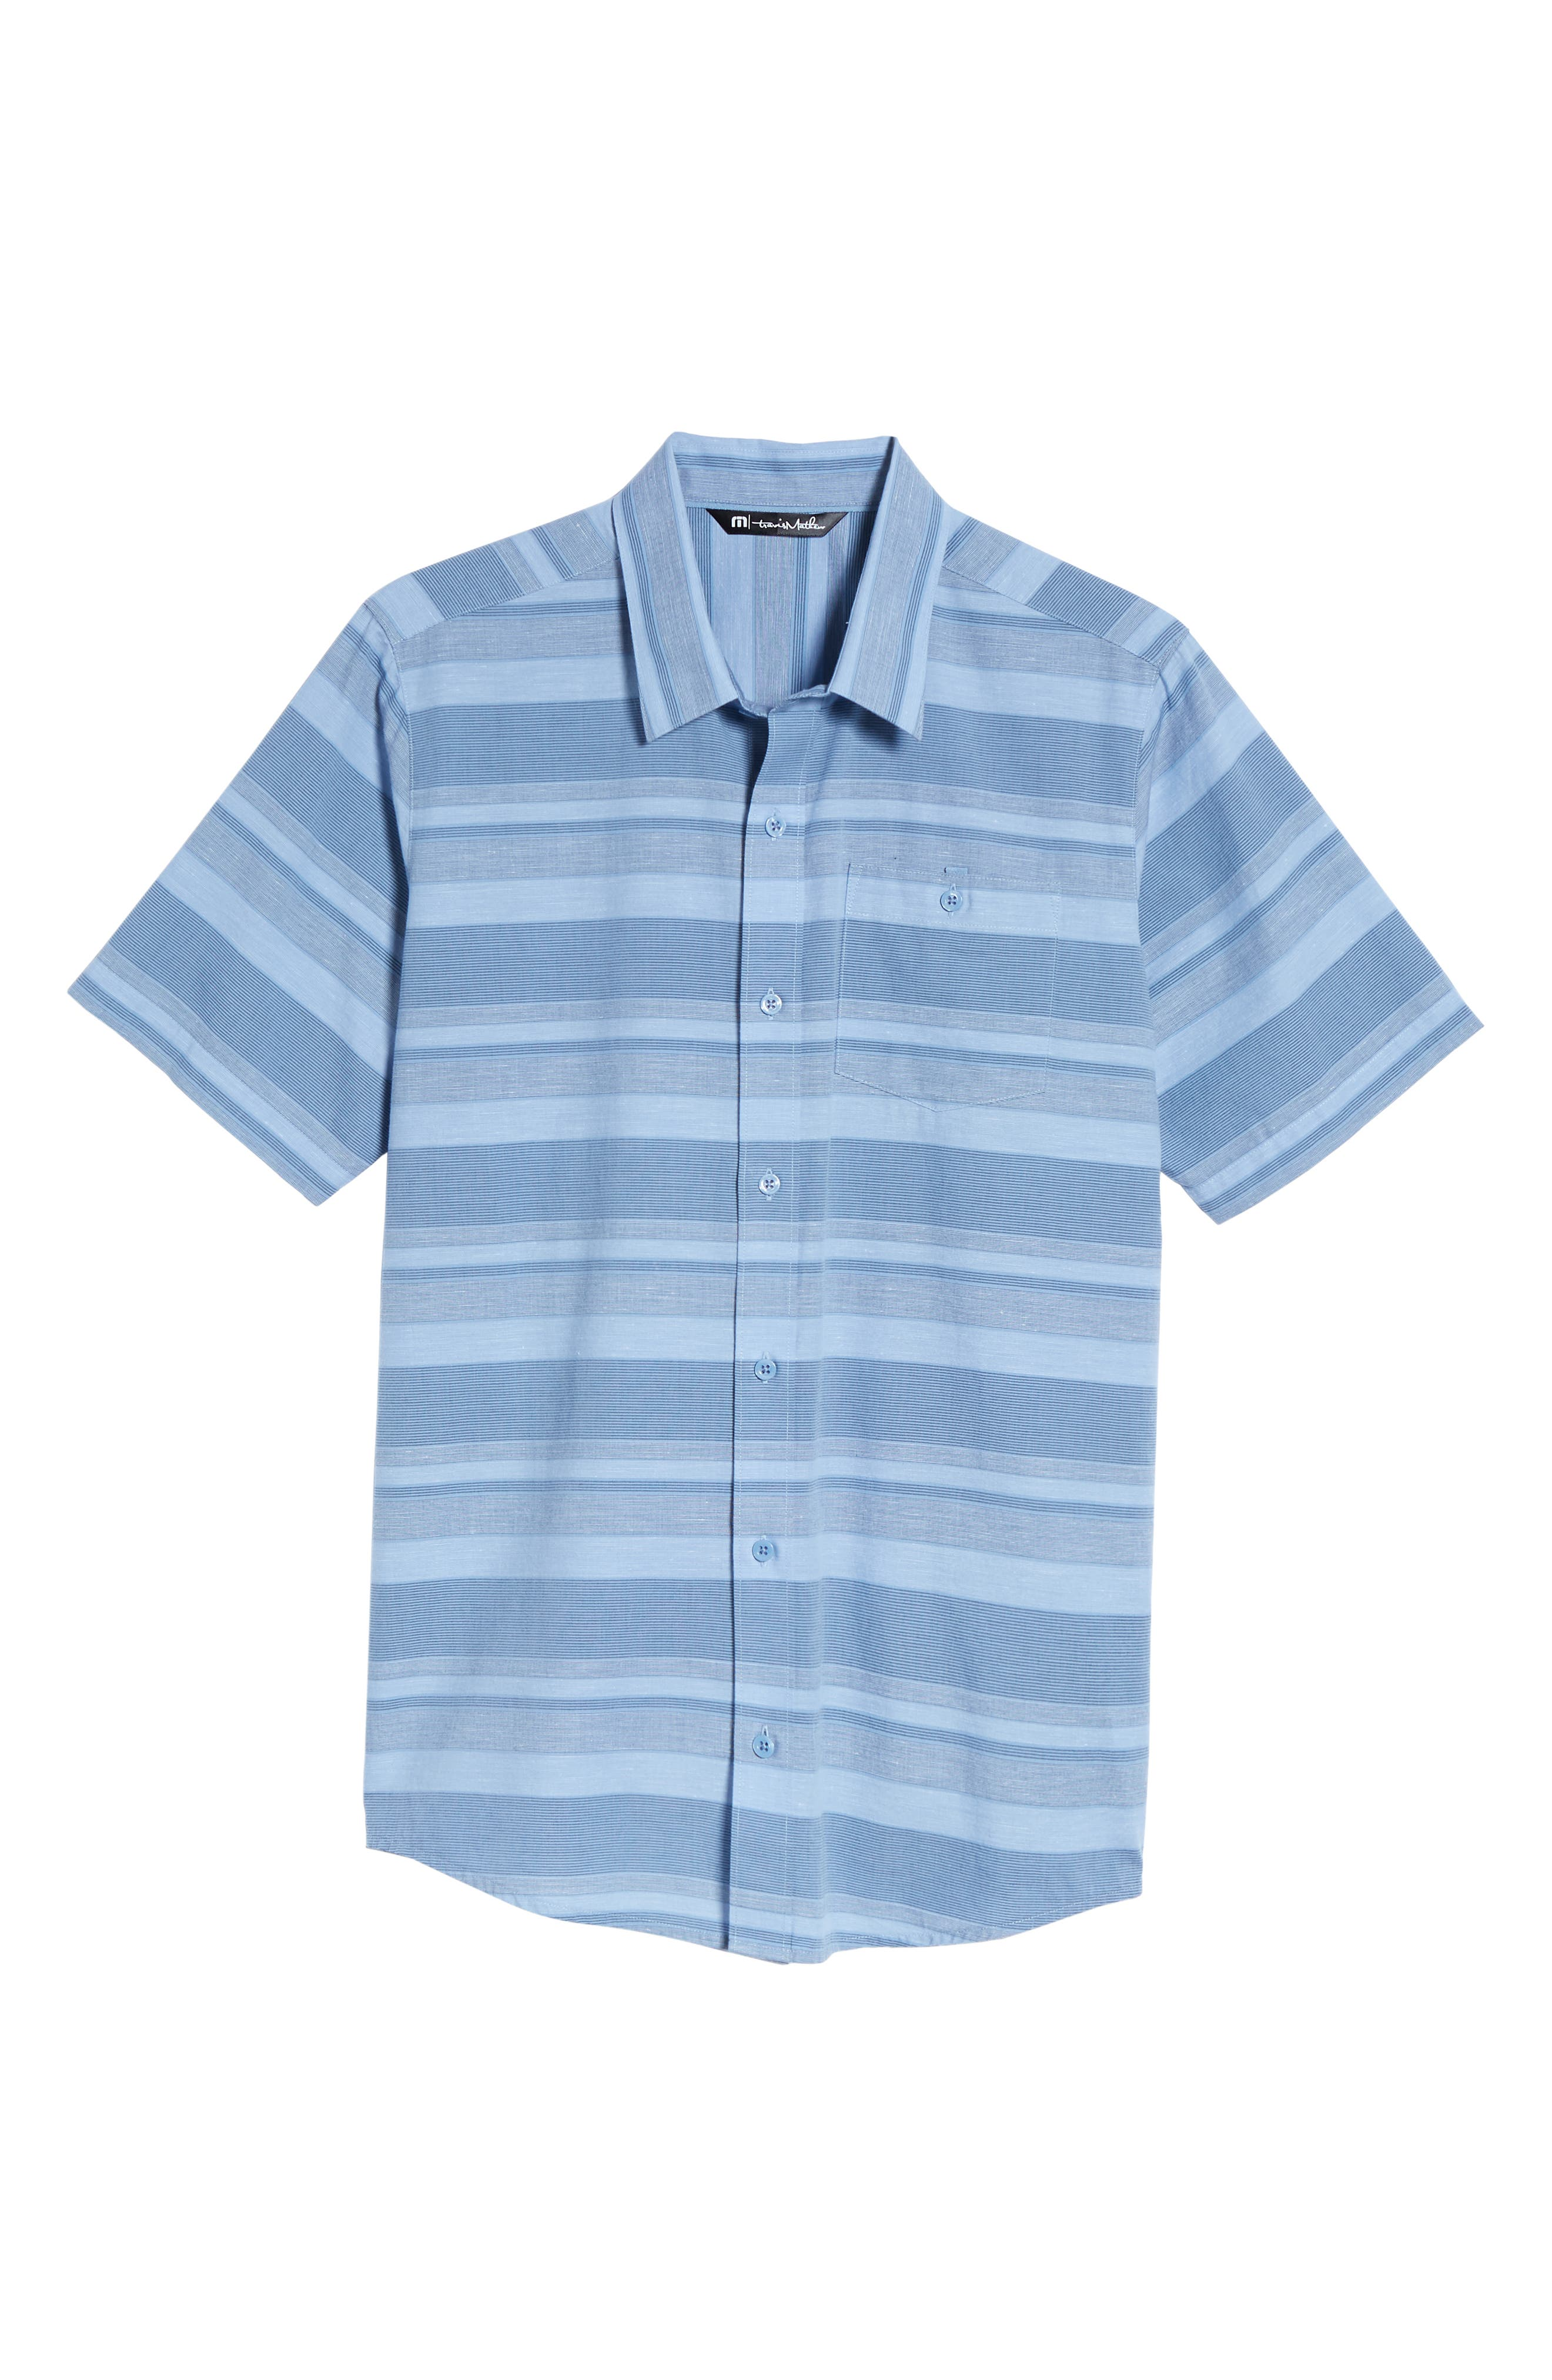 Mahe Regular Fit Sport Shirt,                             Alternate thumbnail 6, color,                             Heather Blue Nights